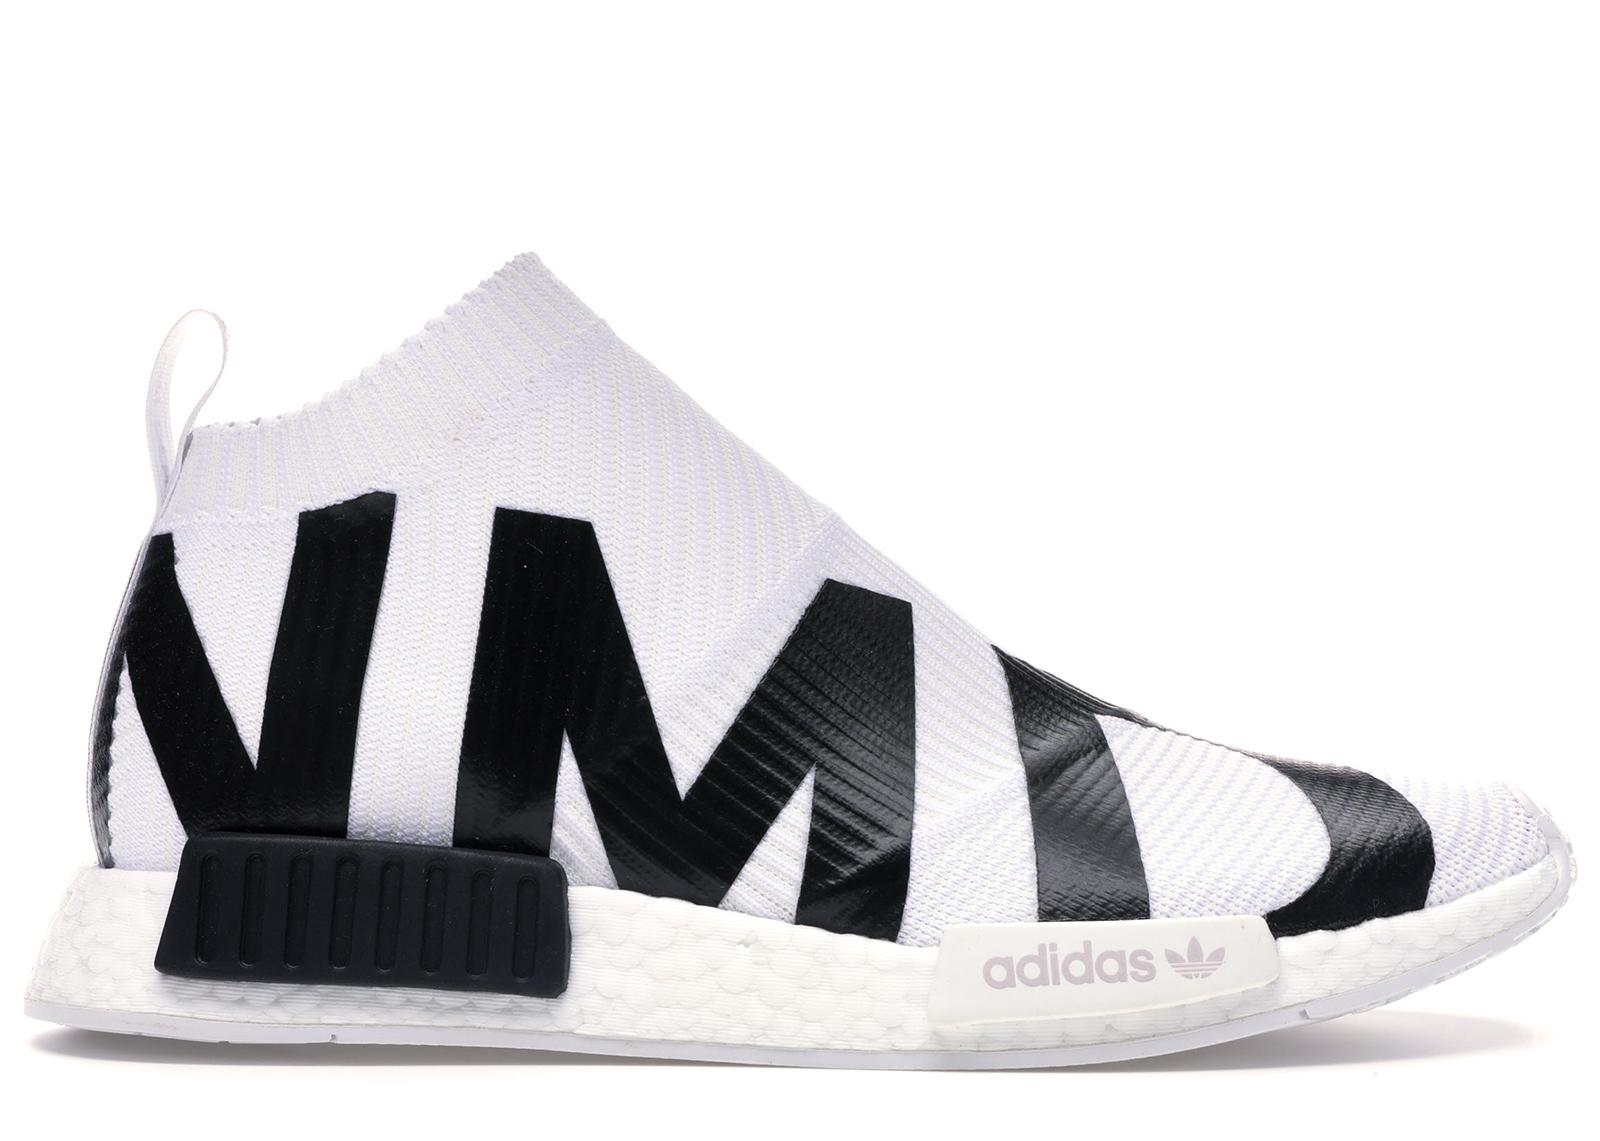 adidas NMD CS1 Bold Branding White